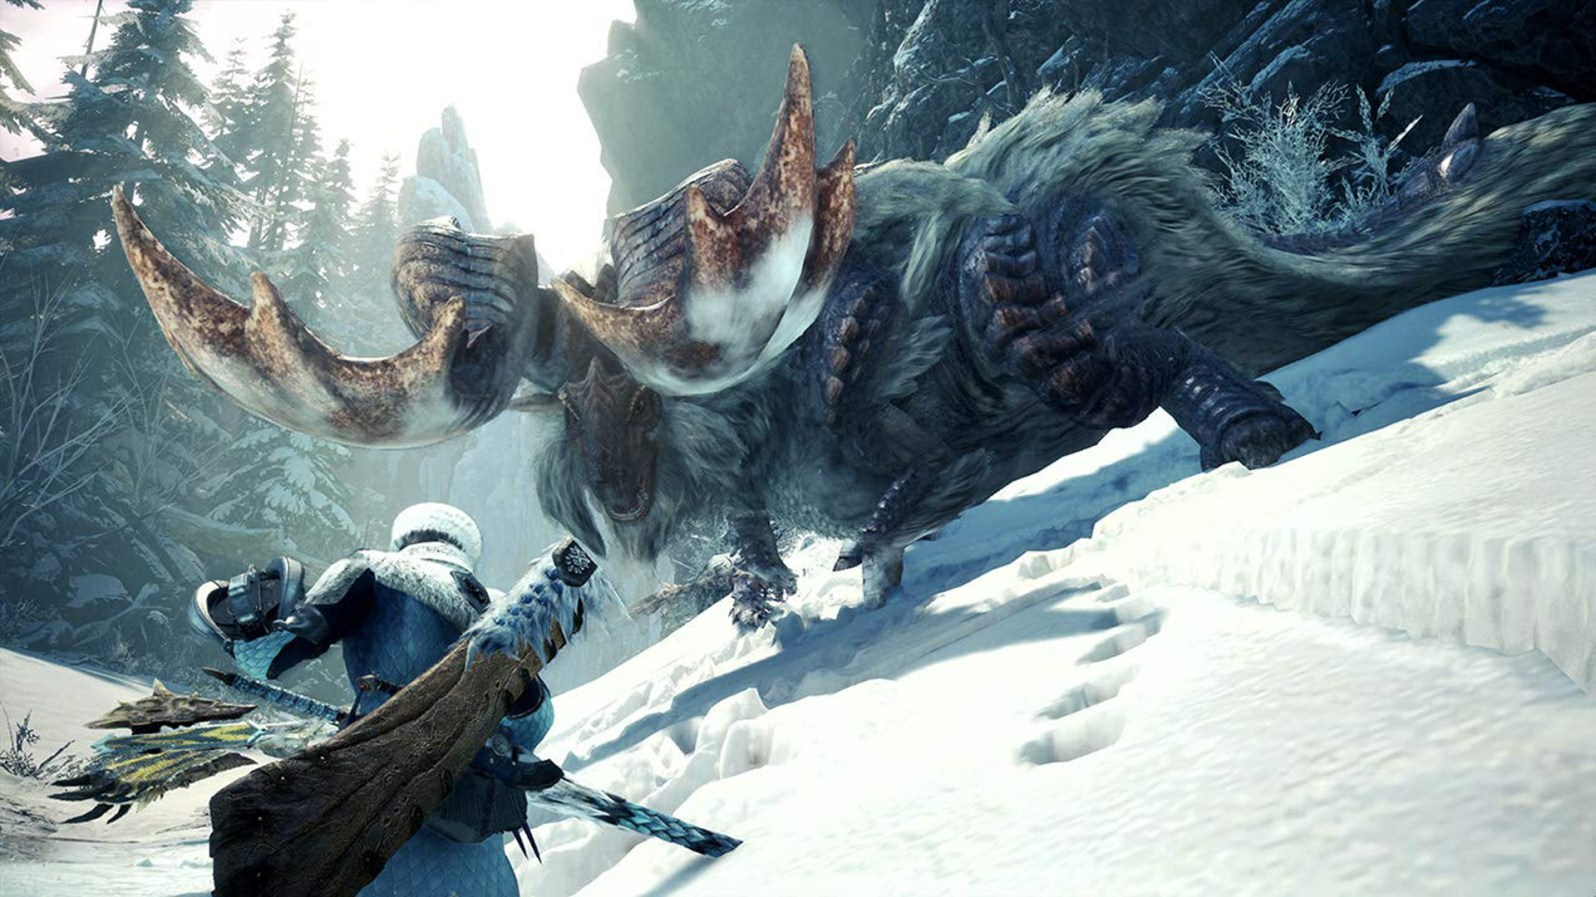 Quelle: Amazon - Monster Hunter World: Iceborne